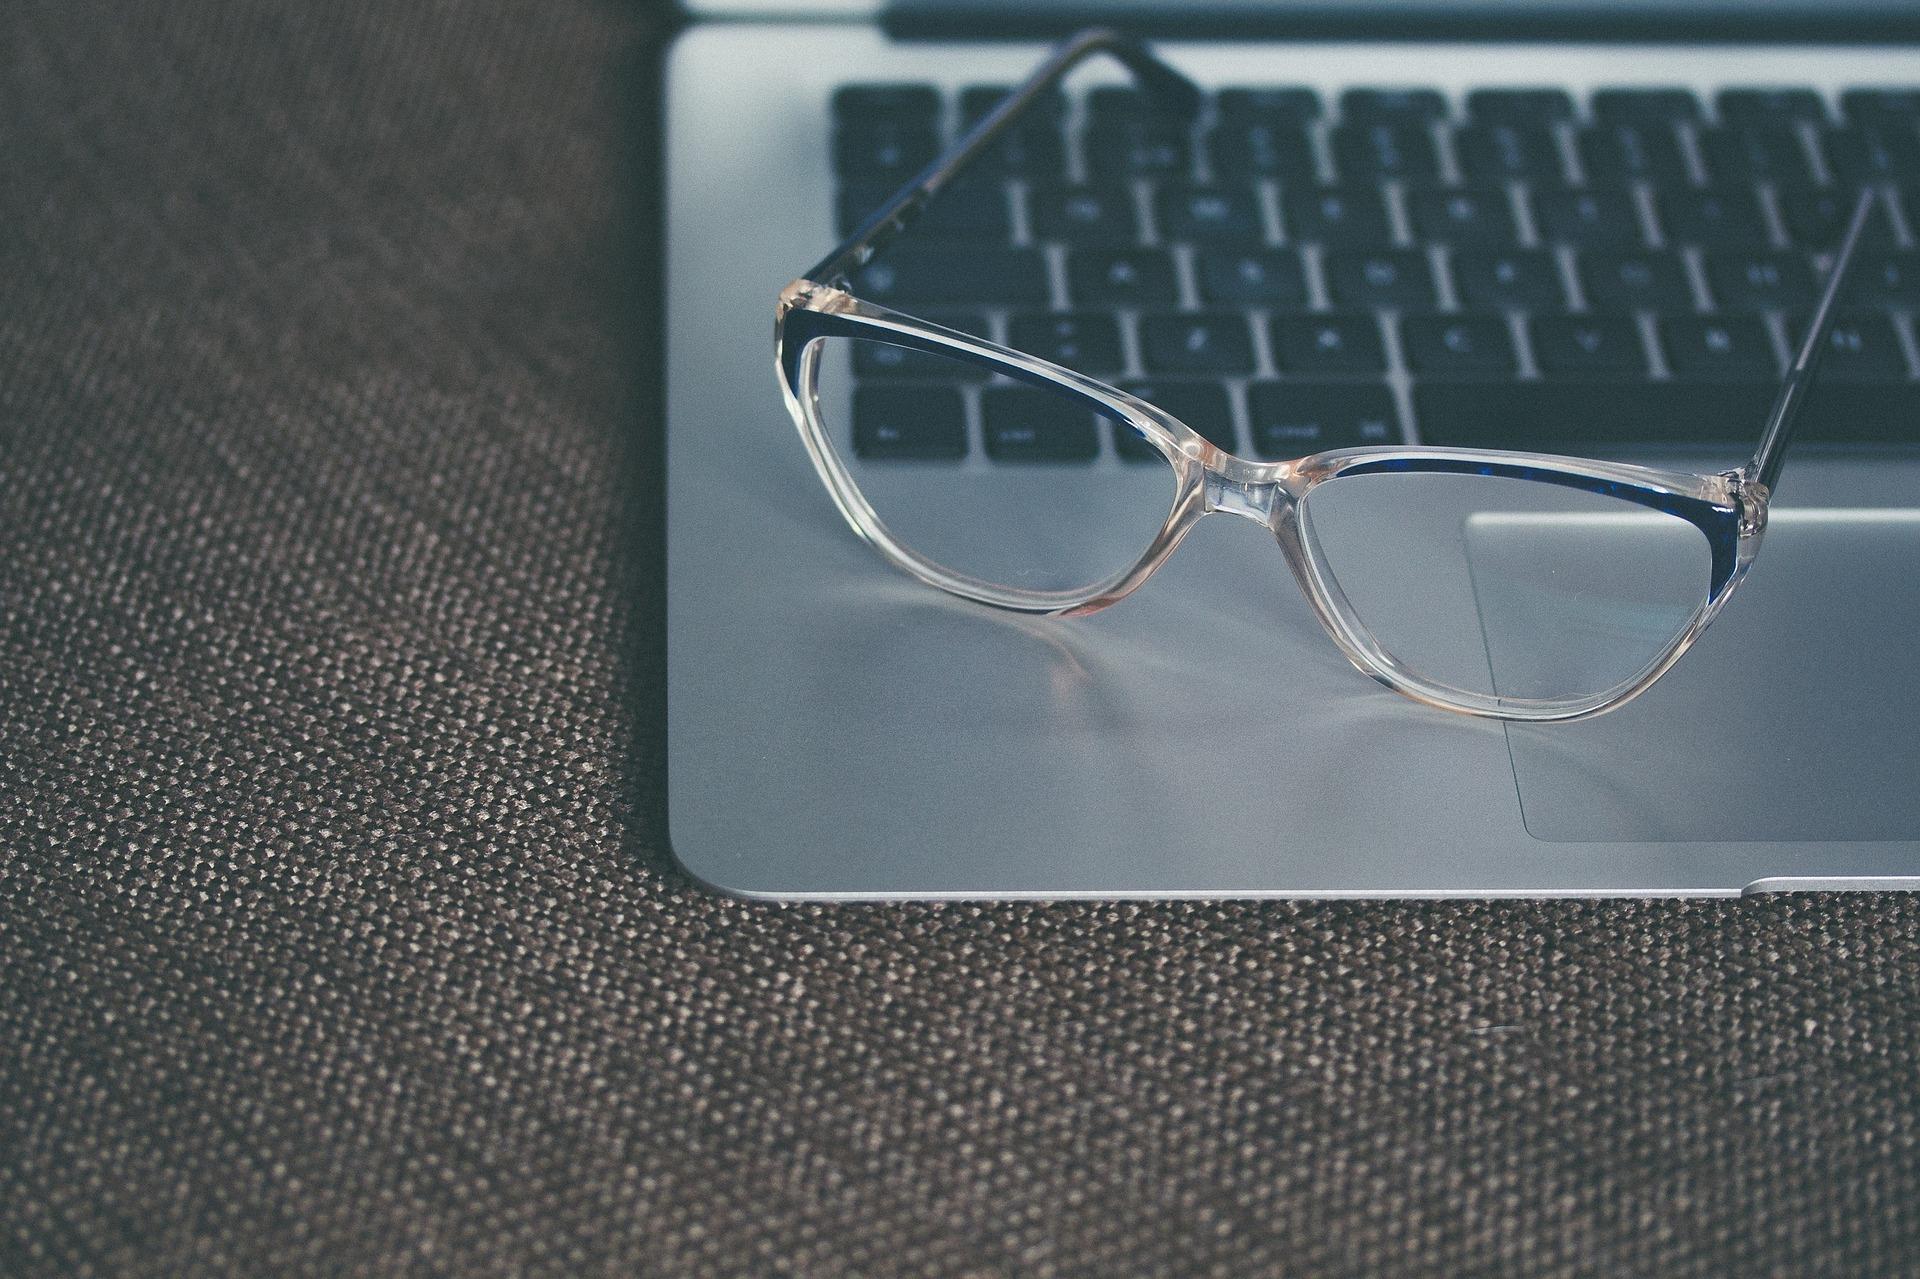 eyeglasses-1245879_1920-1